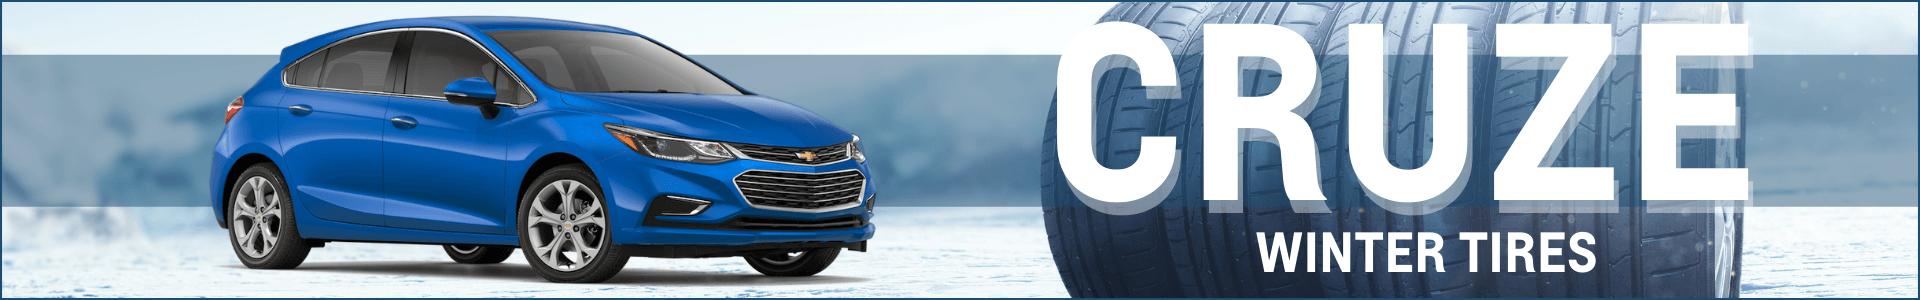 Cruze winter tire deals